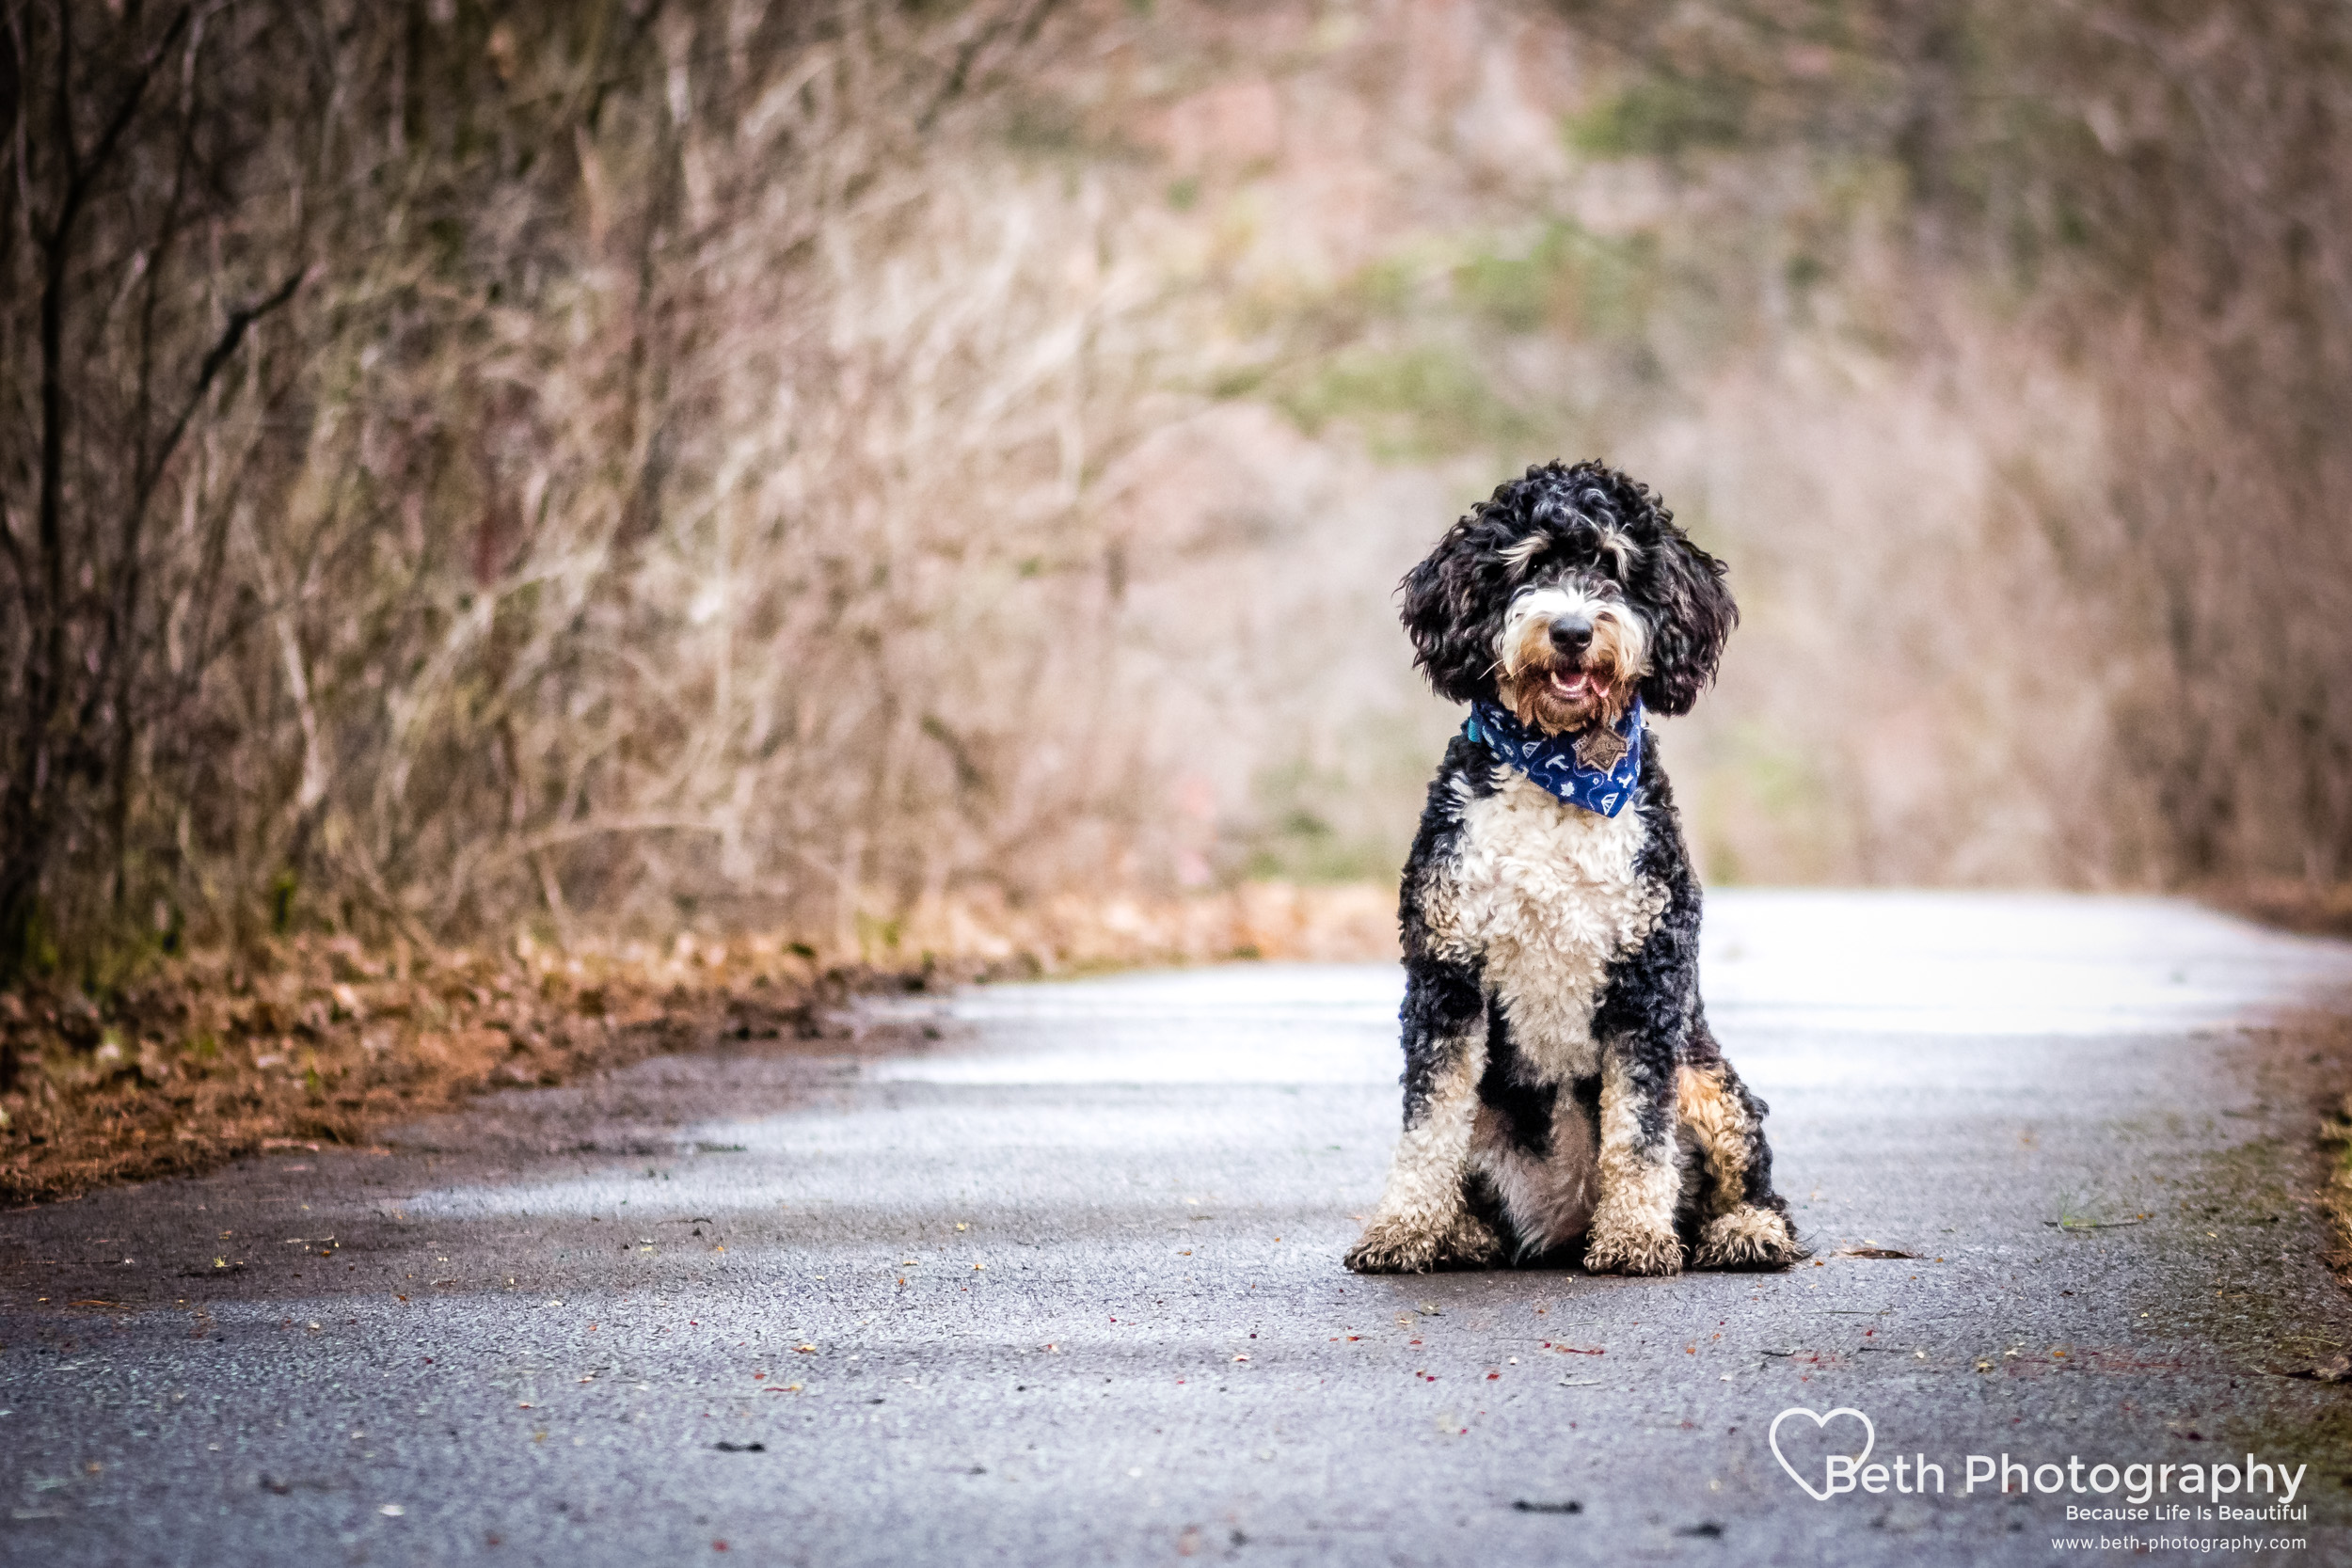 Beth Photography - Pet Photographer -Servicing Ottawa to Cornwall-25.jpg